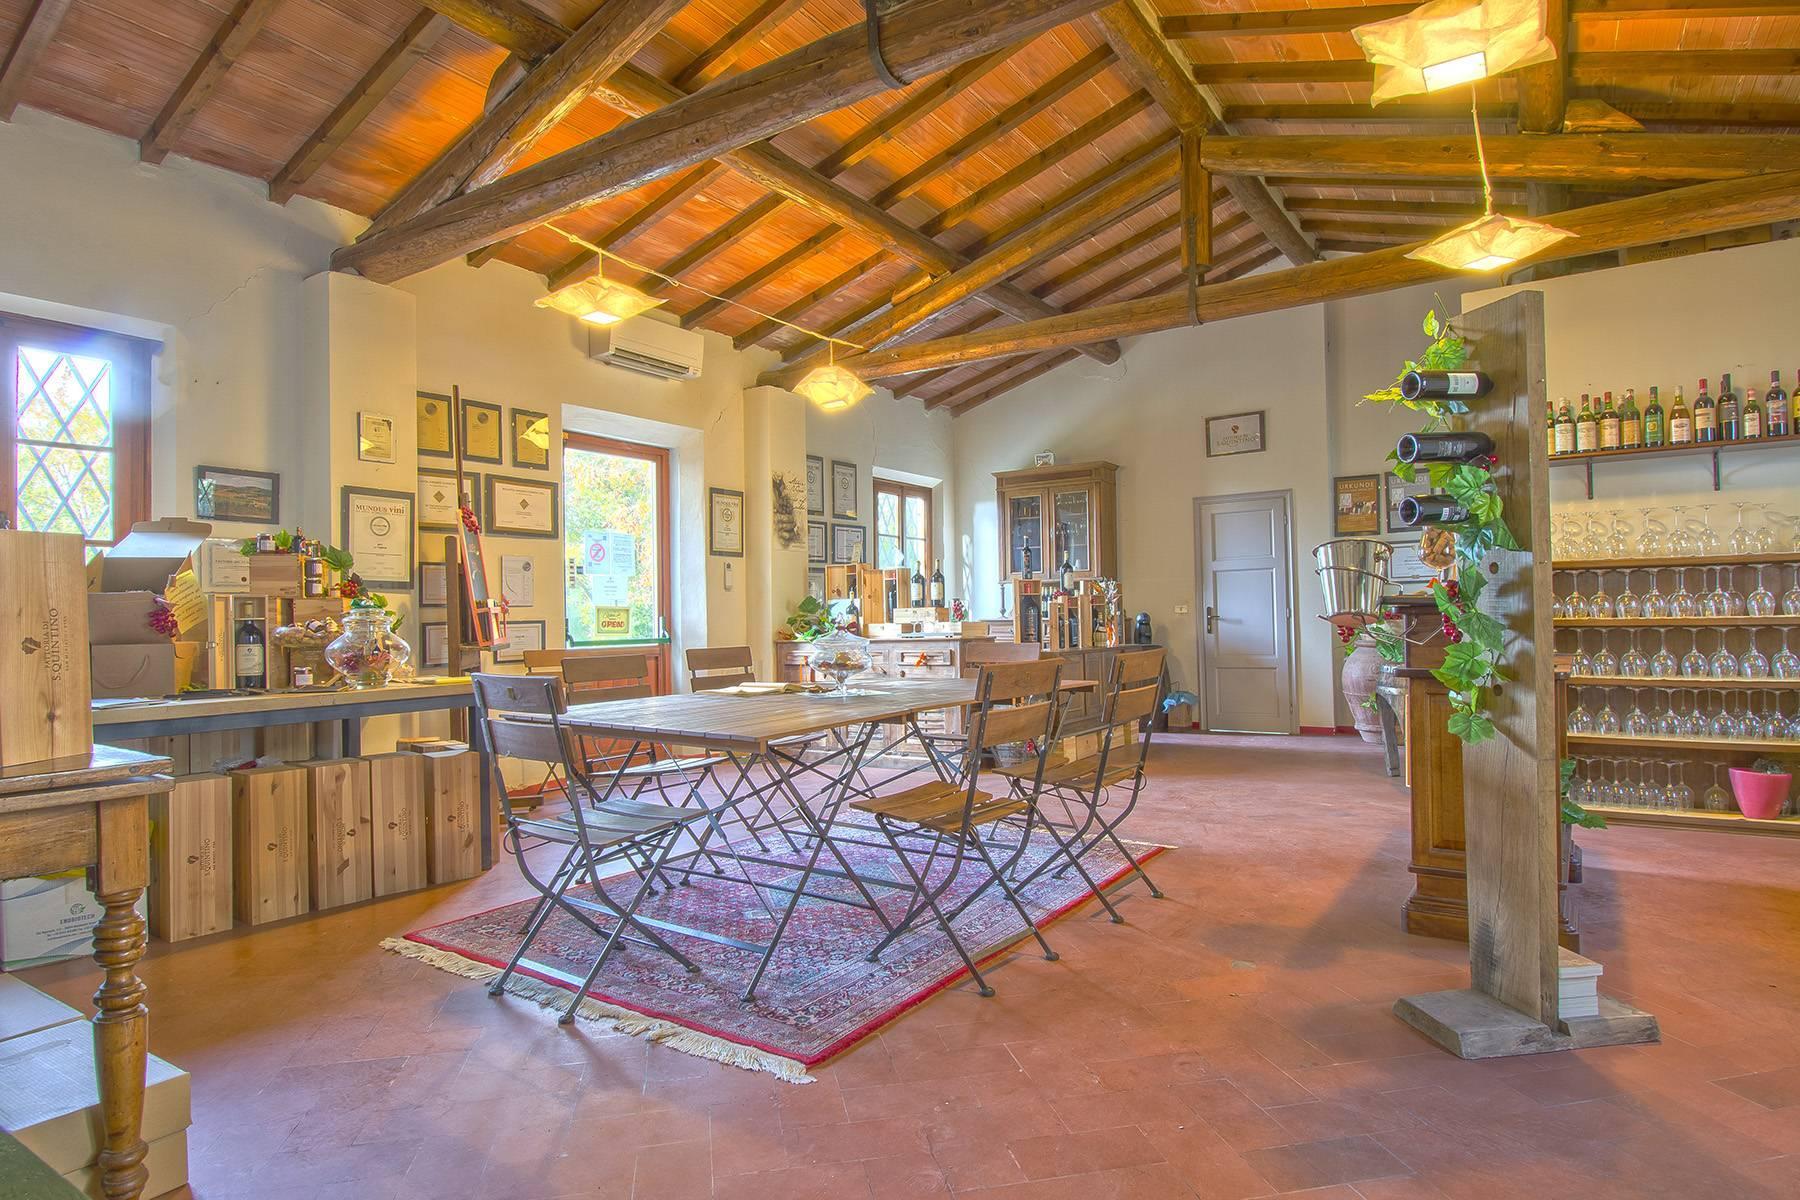 Winery with Historic Villa in San Miniato, Pisa - 21